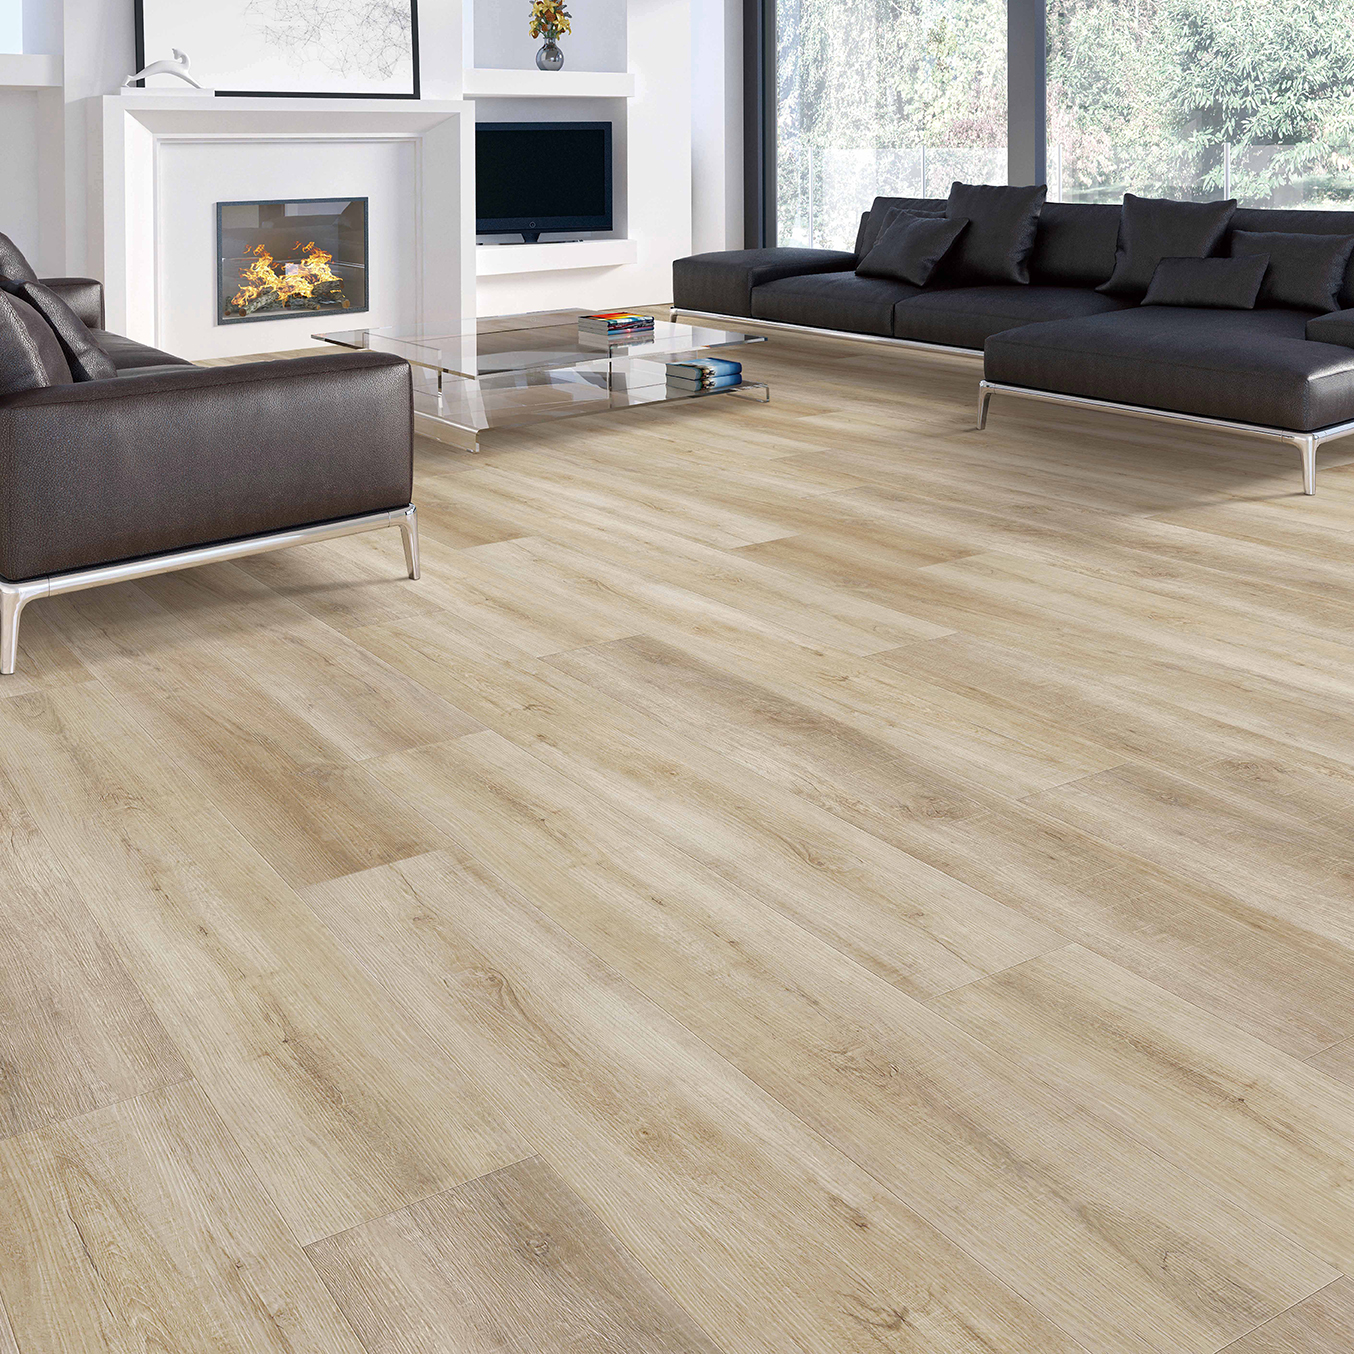 Next Floor - Expanse Plank - 527 715.jpg